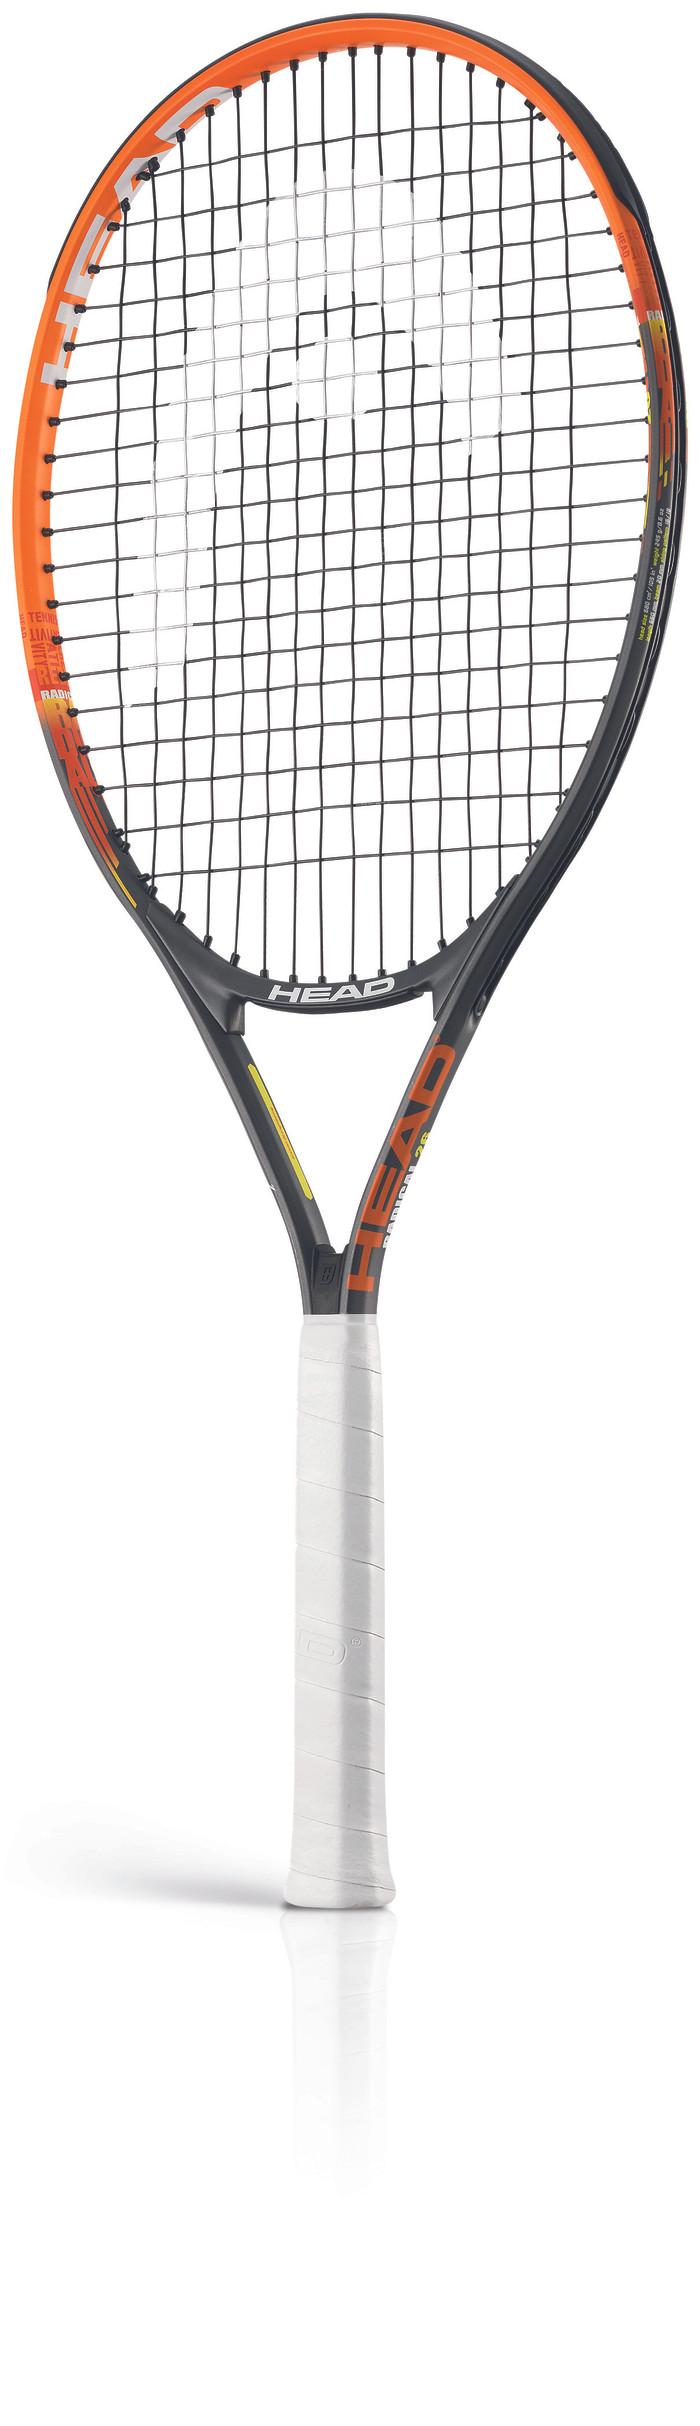 harga Raket tenis head radical 26 jr (240g) Tokopedia.com